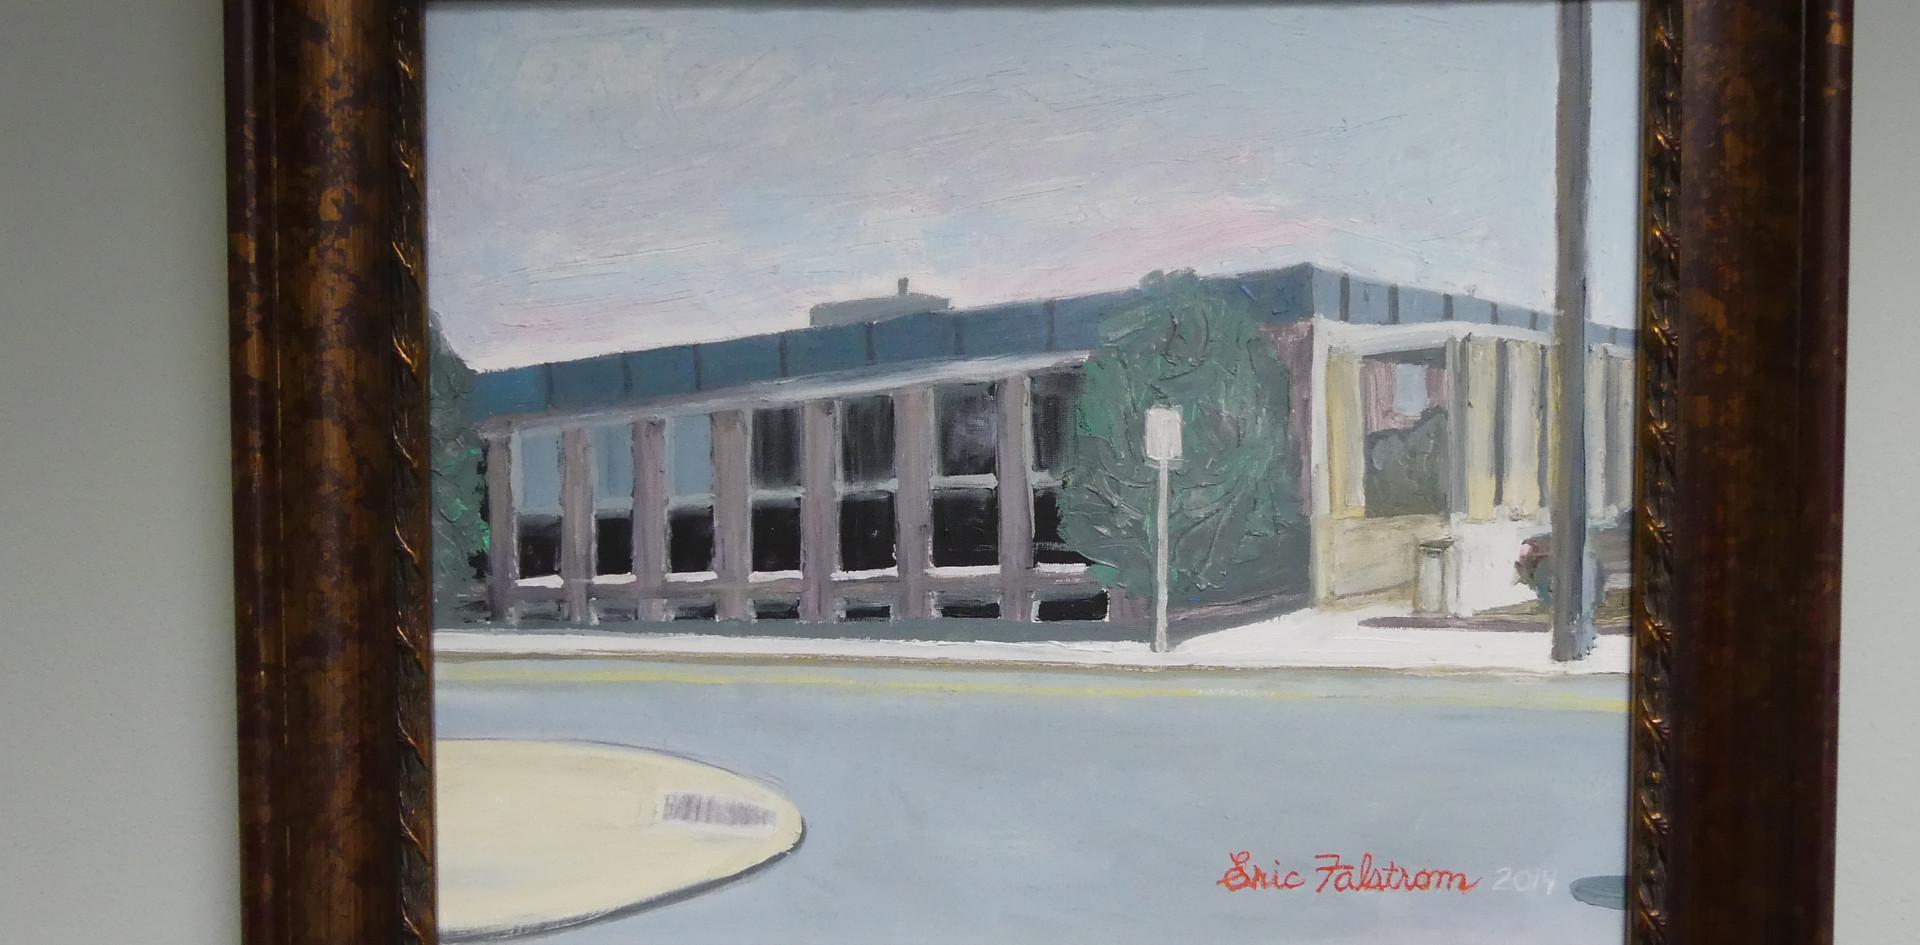 RCHC Building